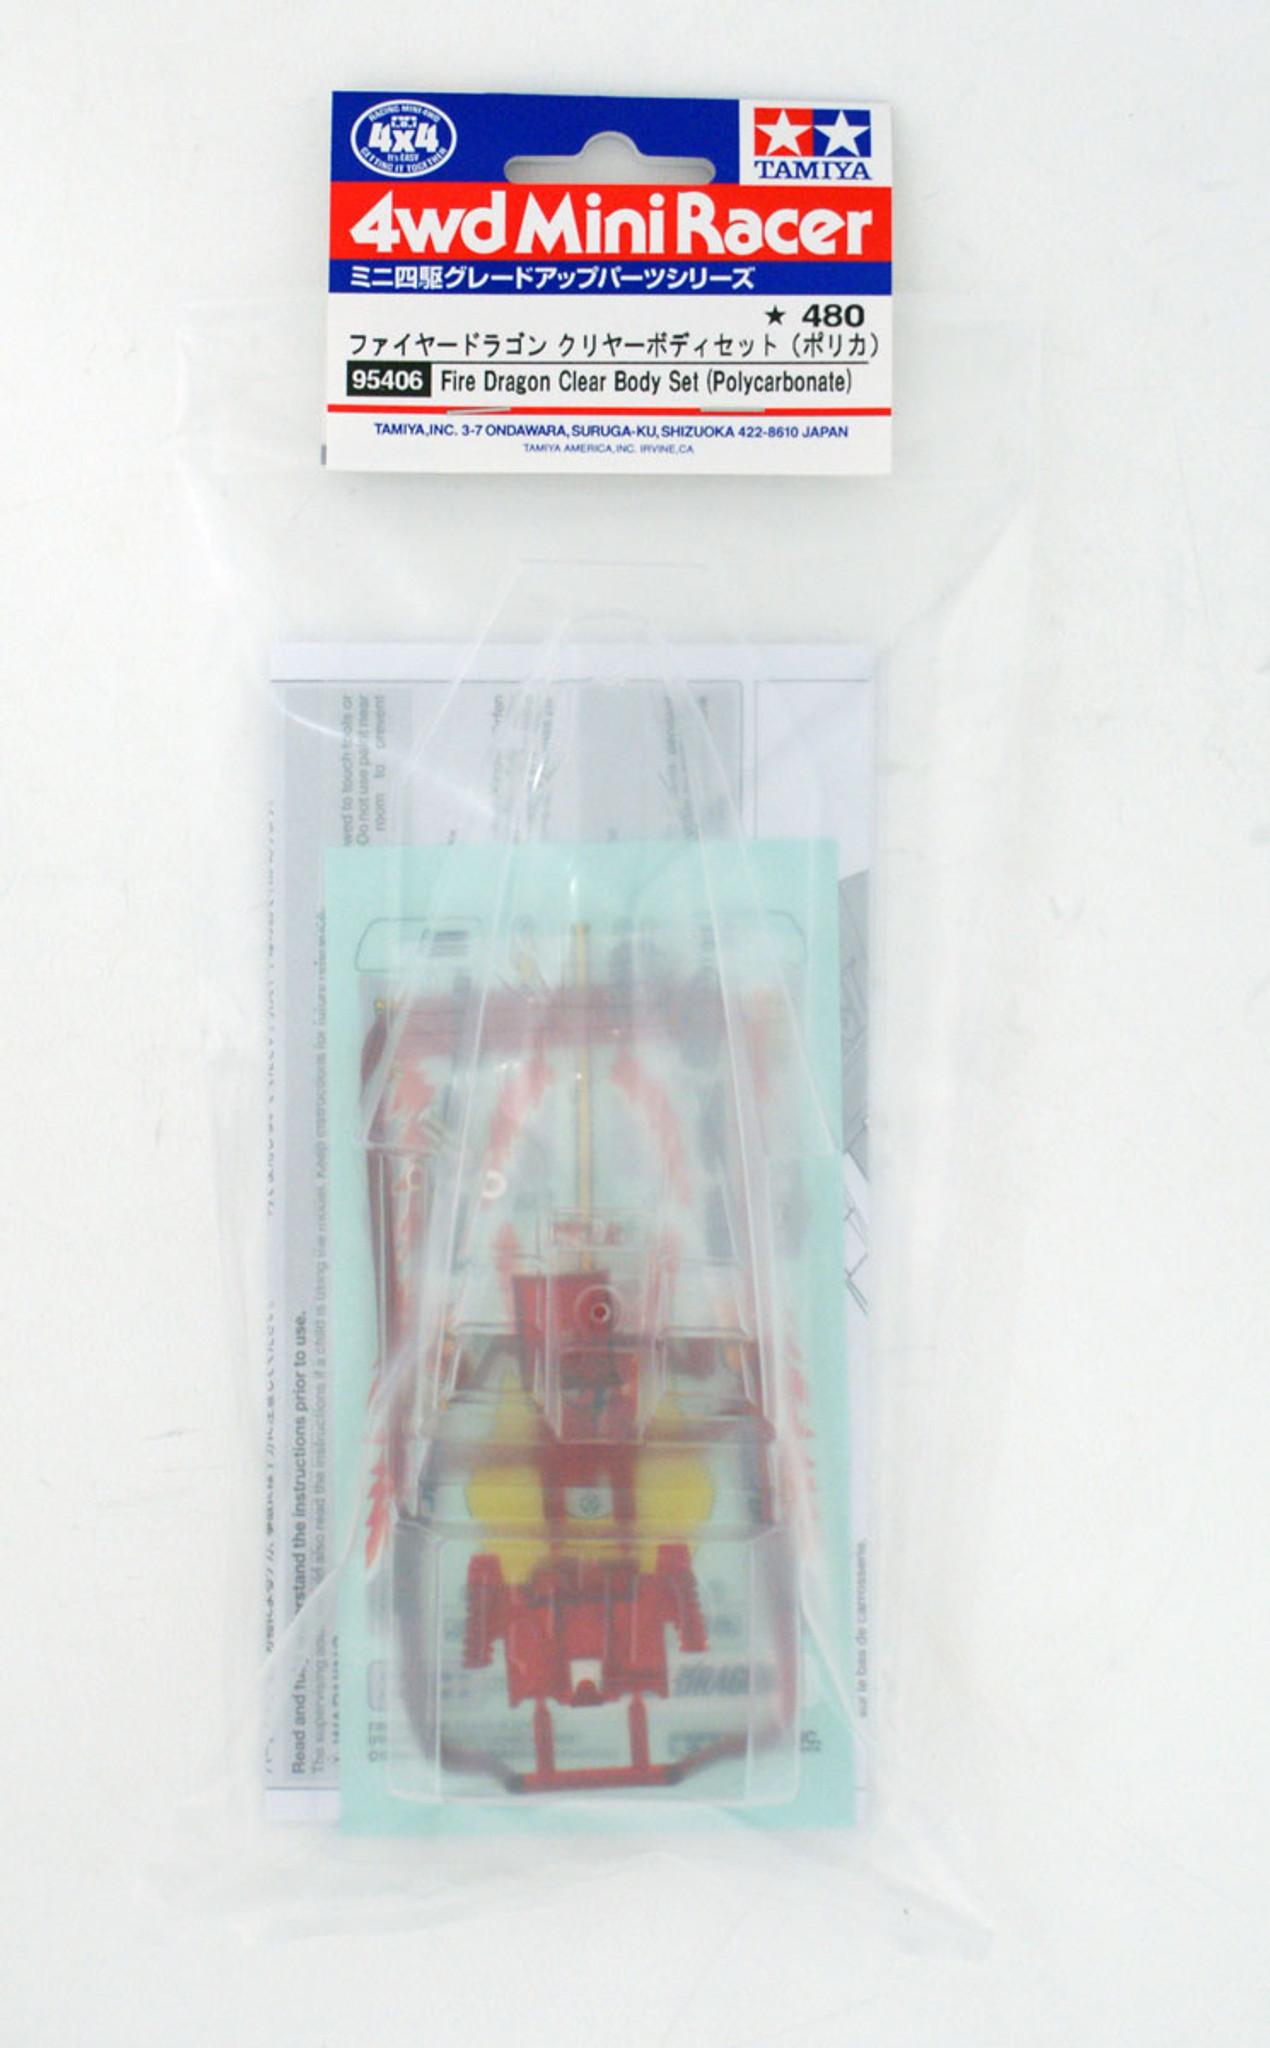 Tamiya 95406 Mini 4WD Fire Dragon Clear Body Set (Polycarbonate) 1/32 Scale